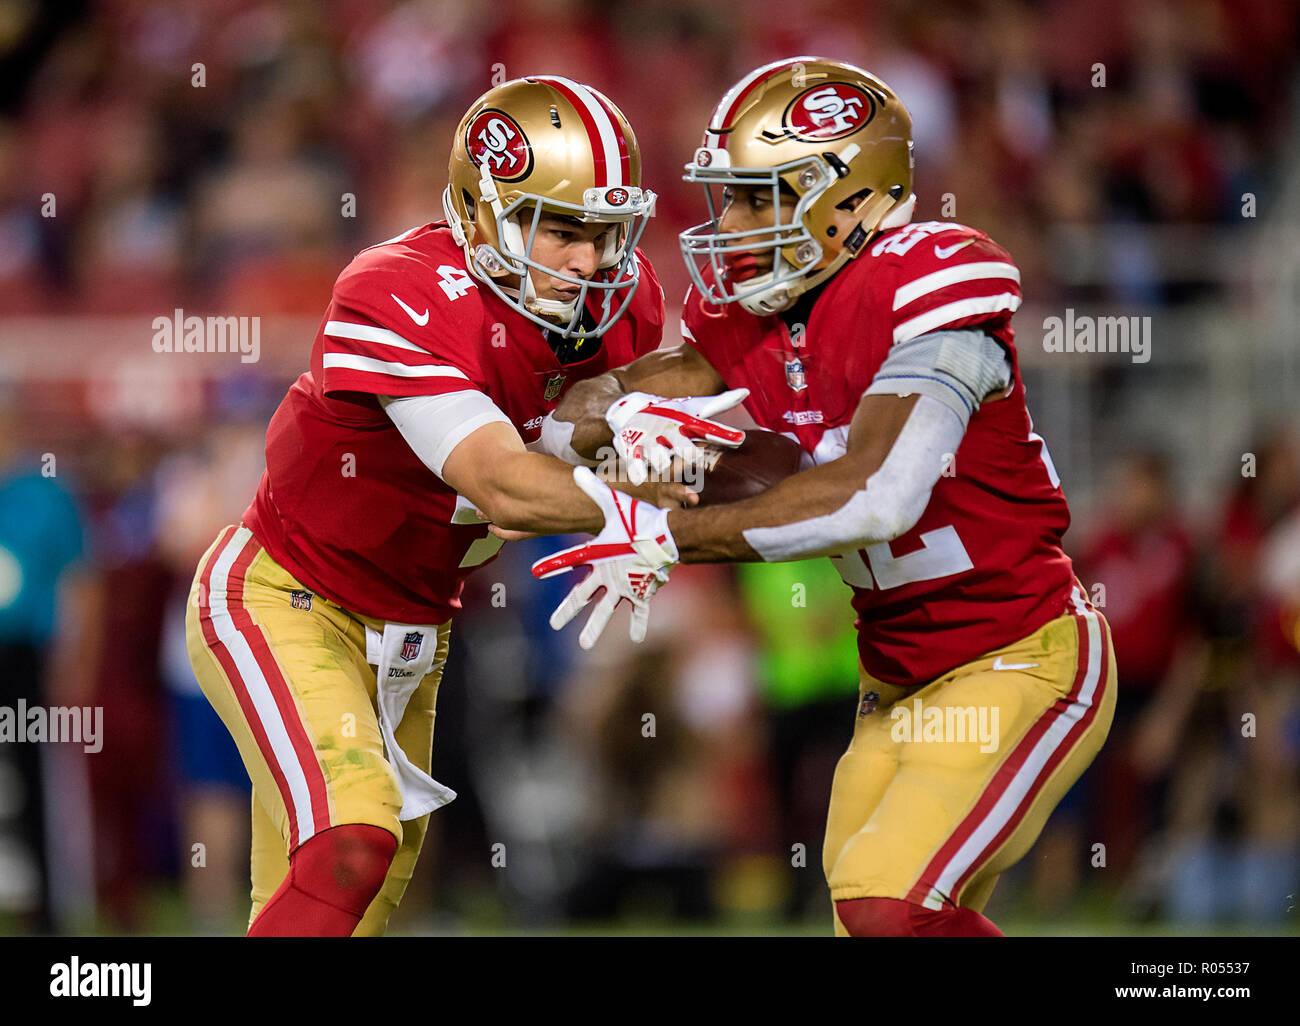 2ffdbcbe4 San Francisco 49ers quarterback Nick Mullens (4) hands off to San Francisco  49ers running back Matt Breida (22) in the second quarter during a game ...